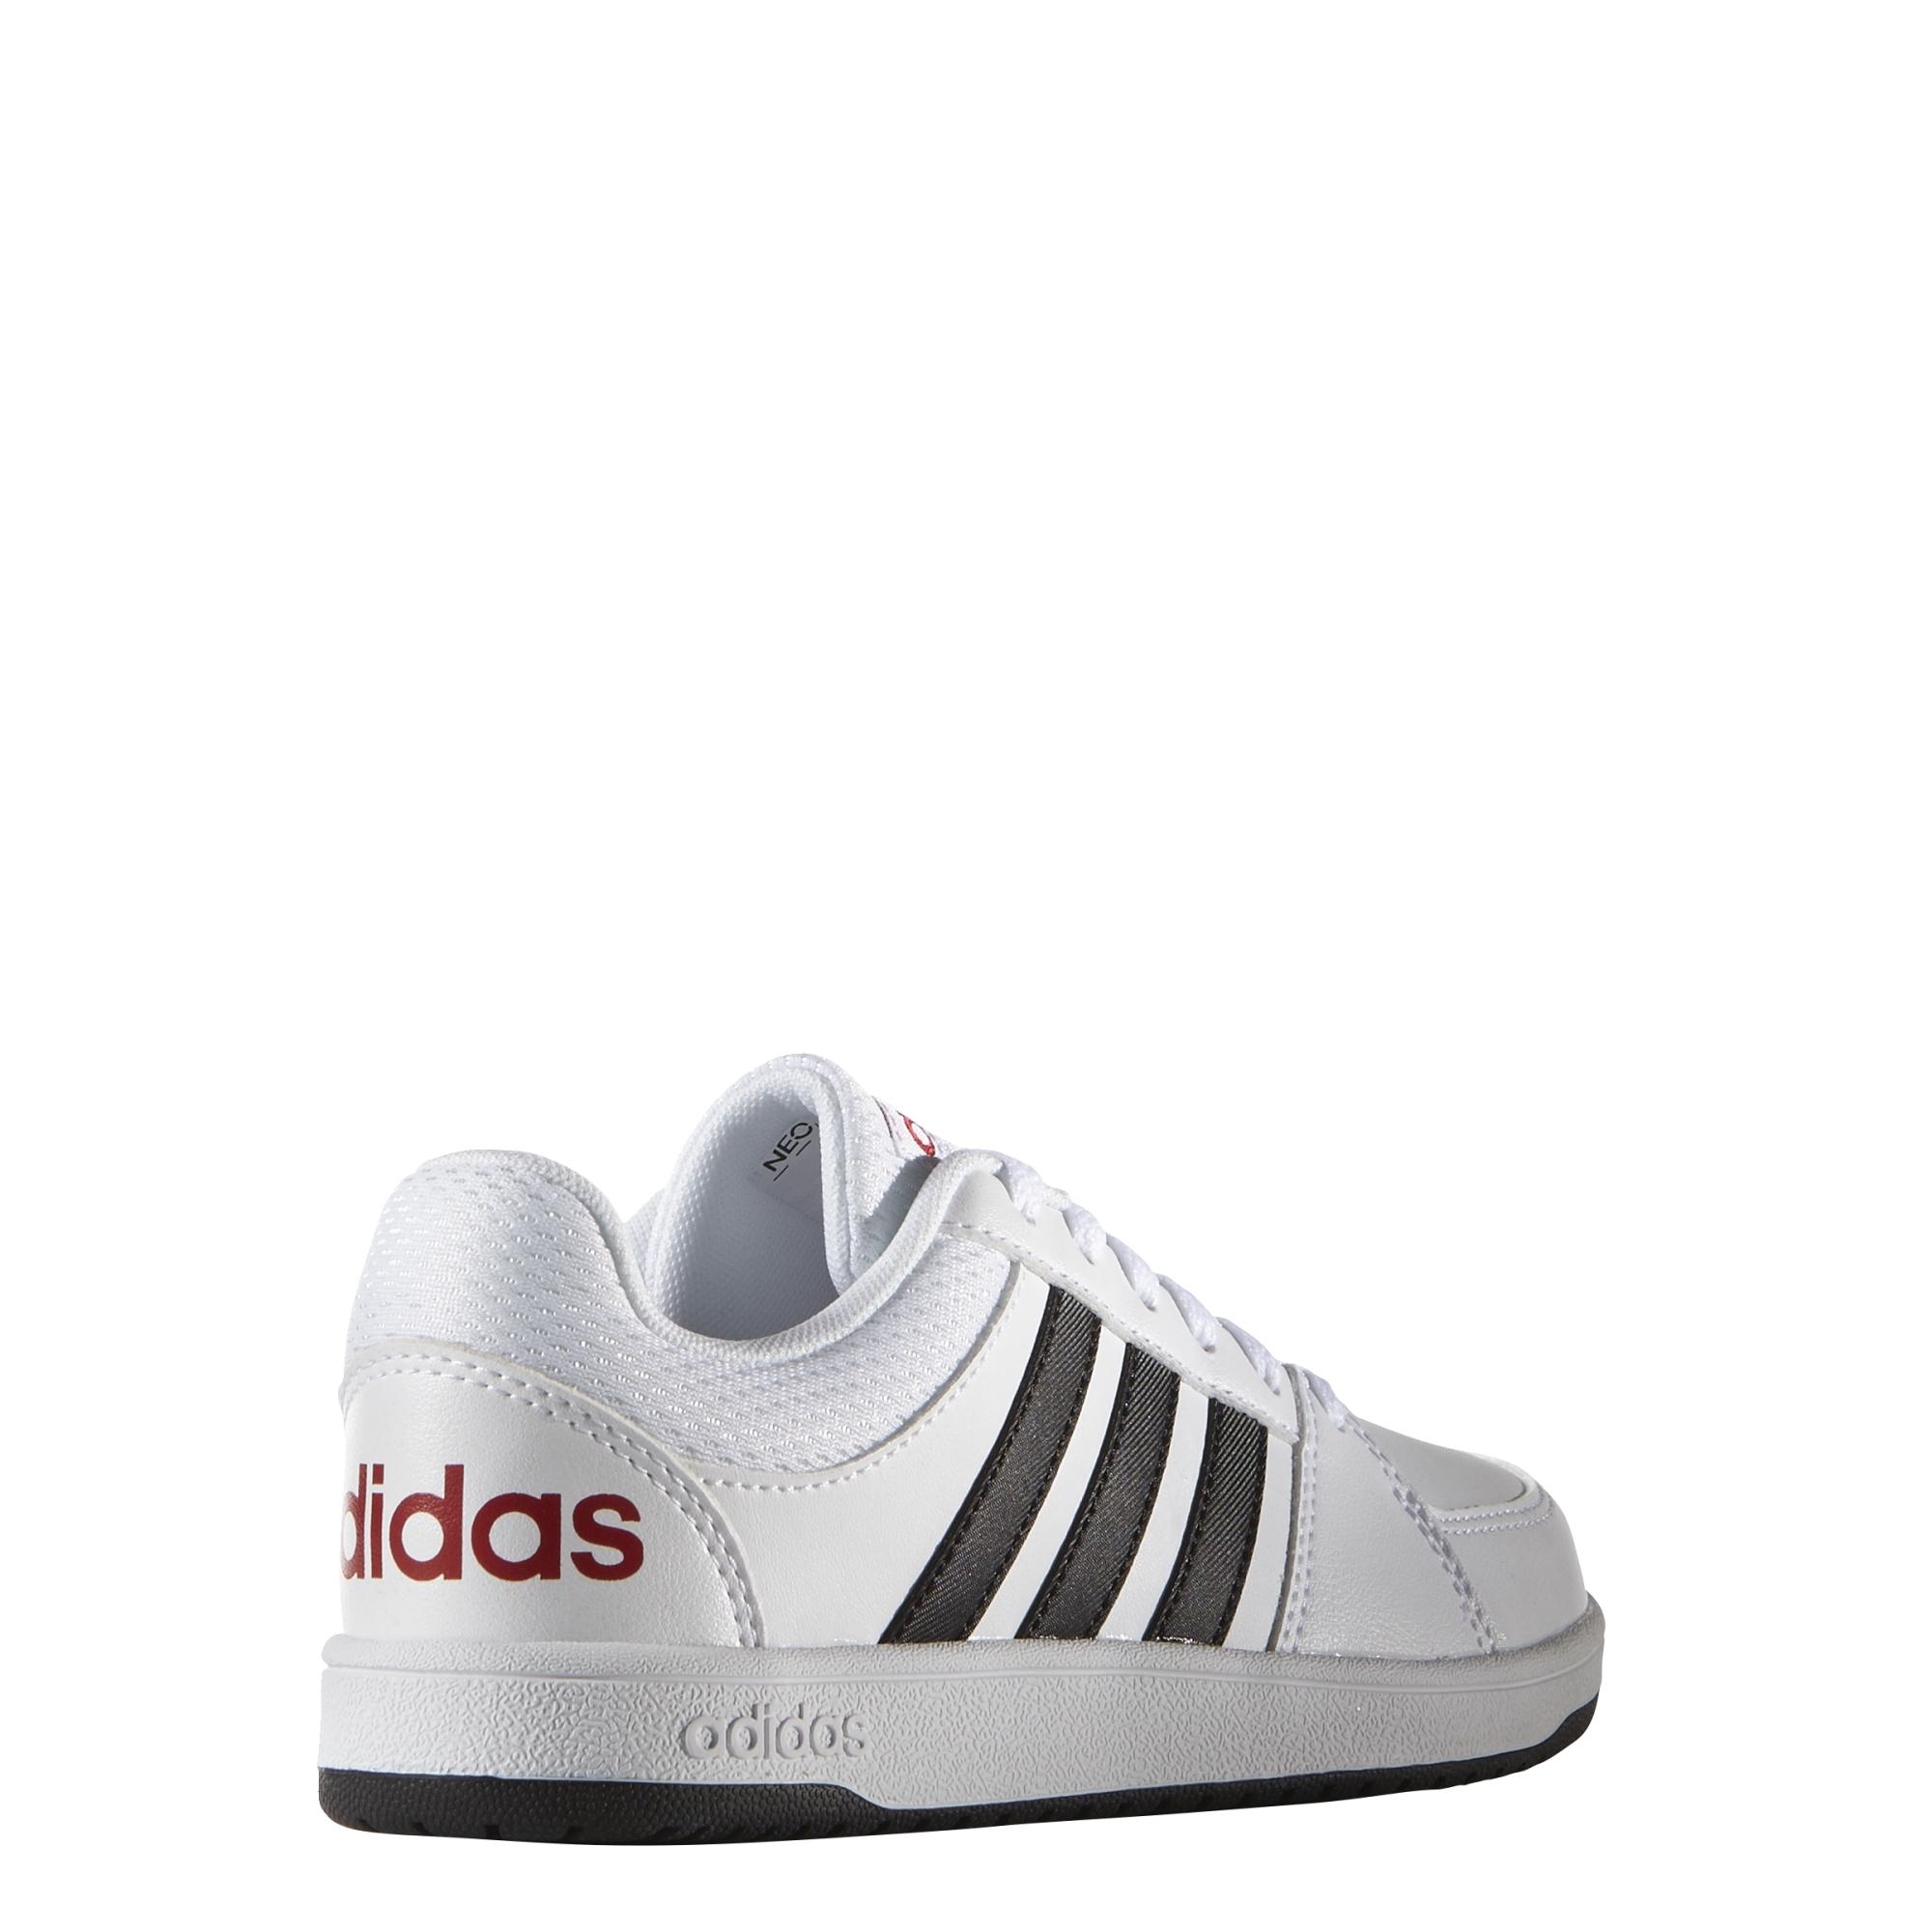 adidas Hoops VS K F99196